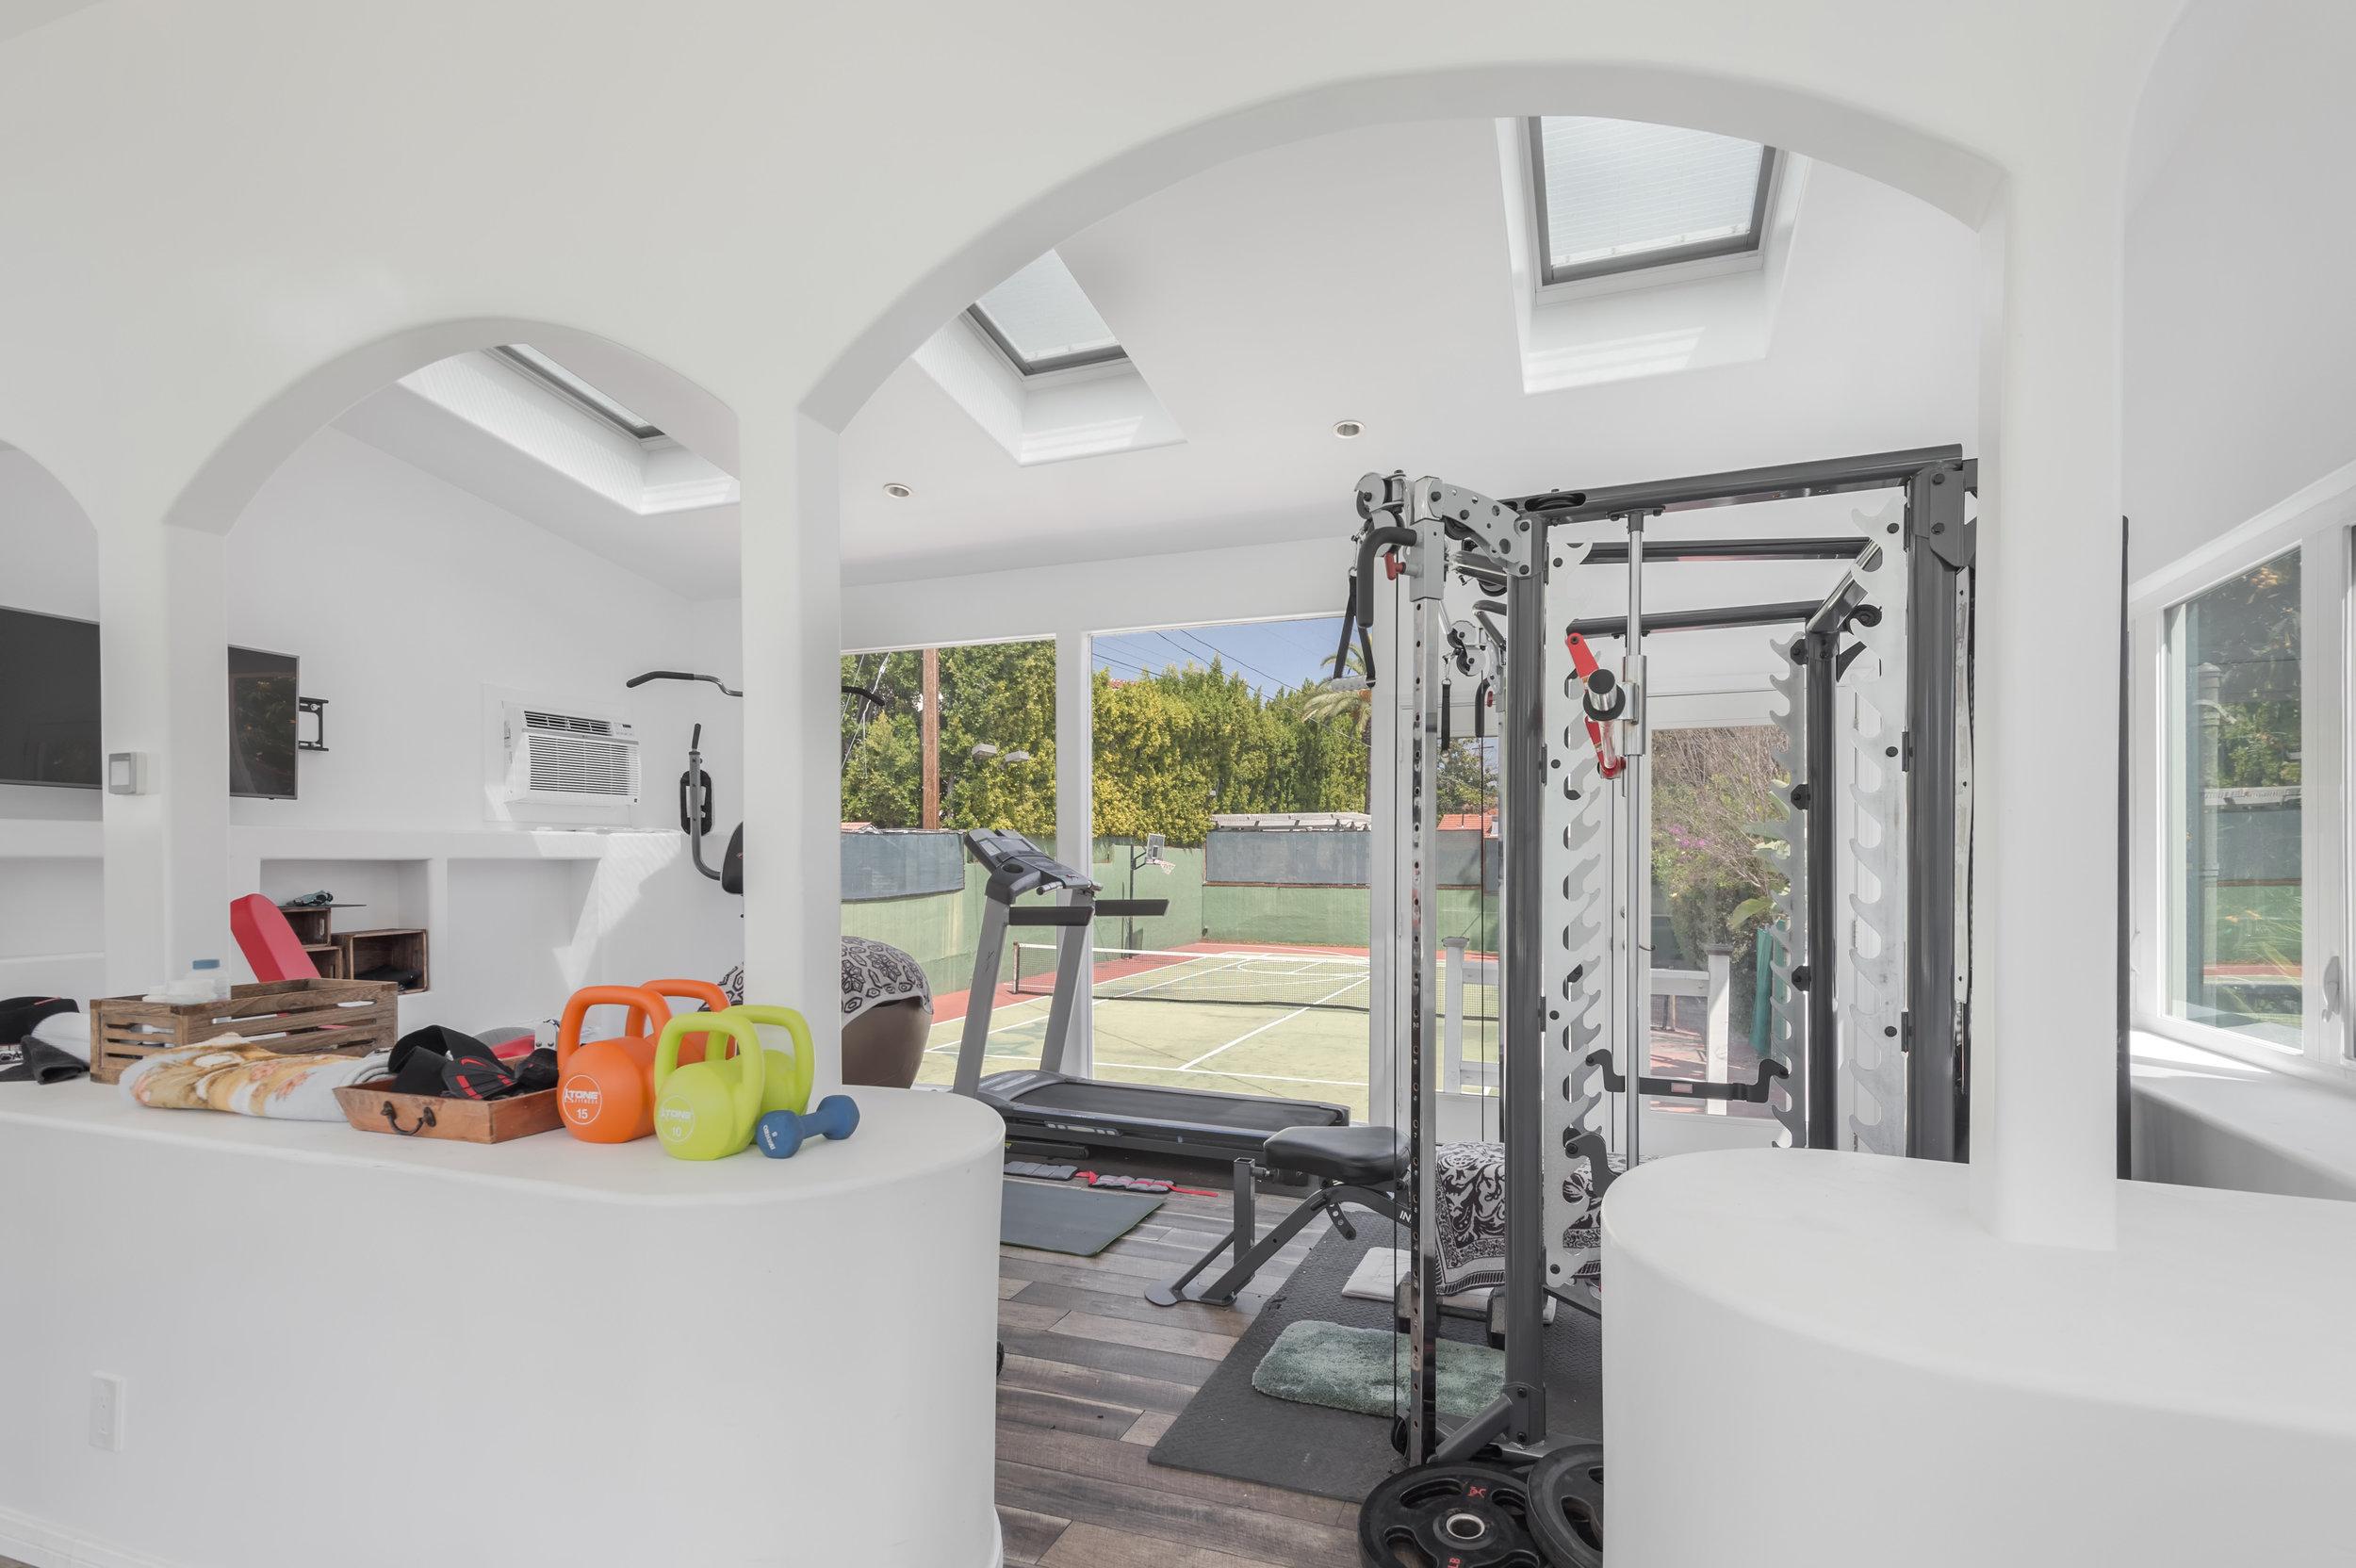 028.1 Gym 006 Pool 4915 Los Feliz For Sale Los Angeles Lease The Malibu Life Team Luxury Real Estate.jpg